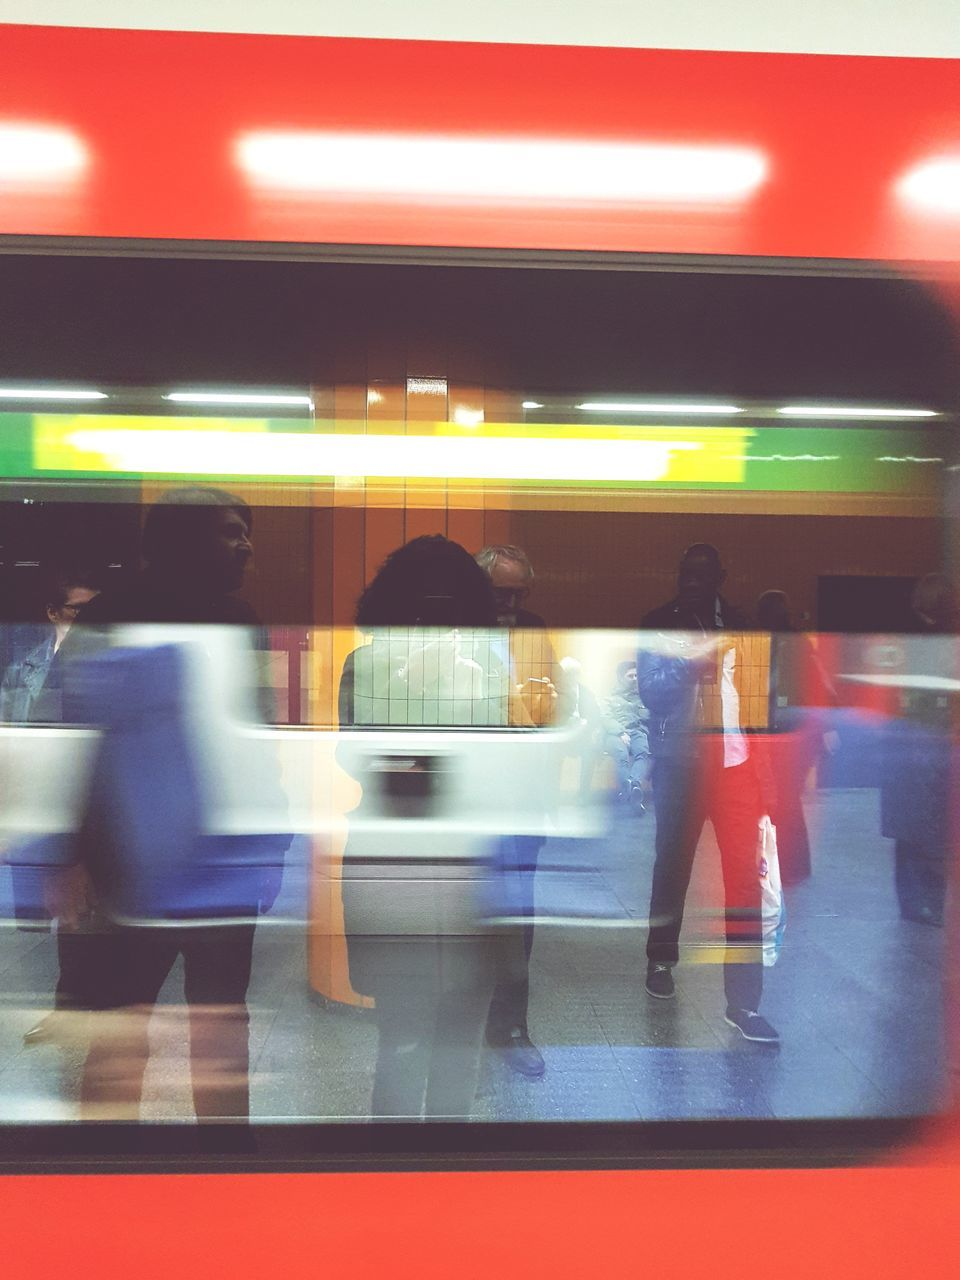 blurred motion, transportation, public transportation, motion, illuminated, train - vehicle, speed, real people, railroad station, indoors, passenger, rail transportation, mode of transport, travel, journey, subway train, women, commuter, walking, men, large group of people, waiting, long exposure, lifestyles, station, day, people